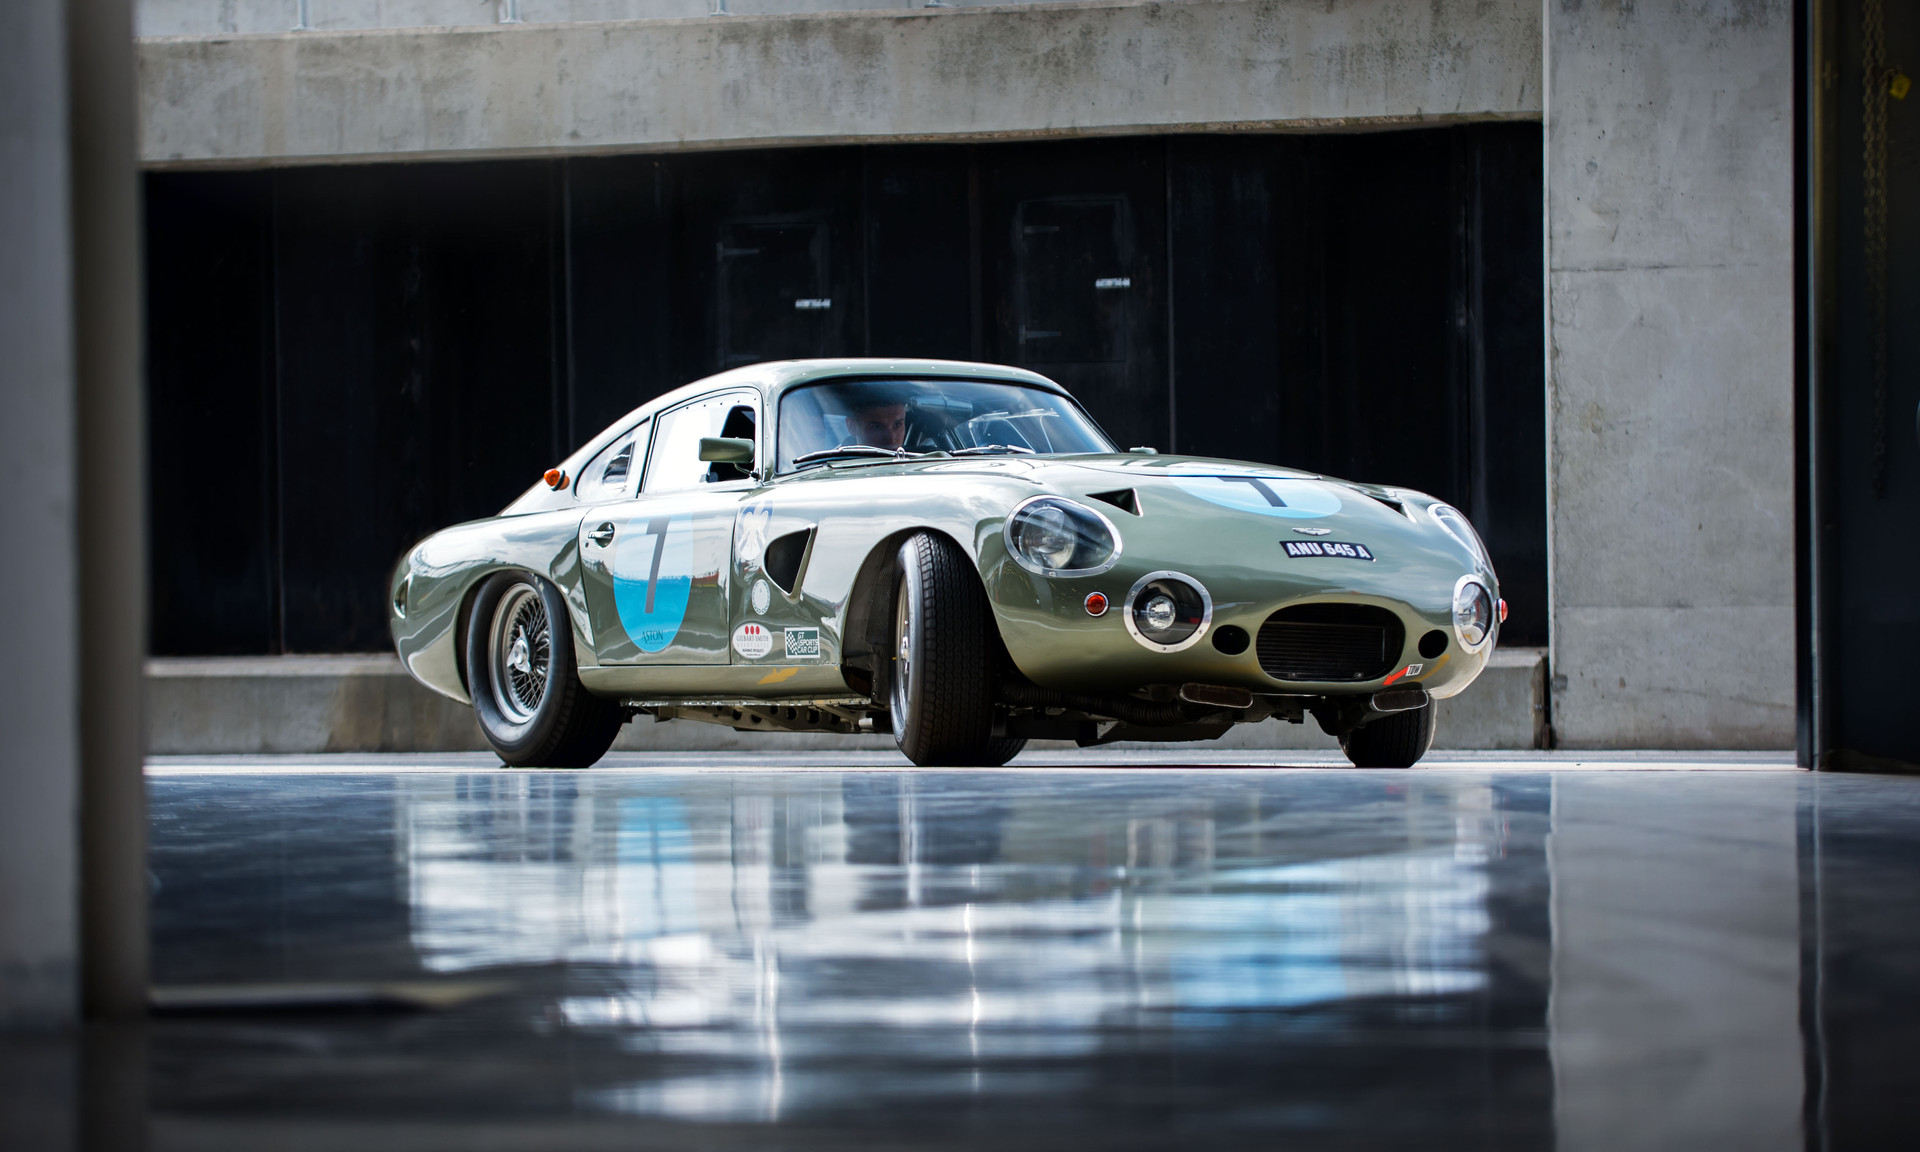 Wolfgang Friedrichs' Aston Martin DP214